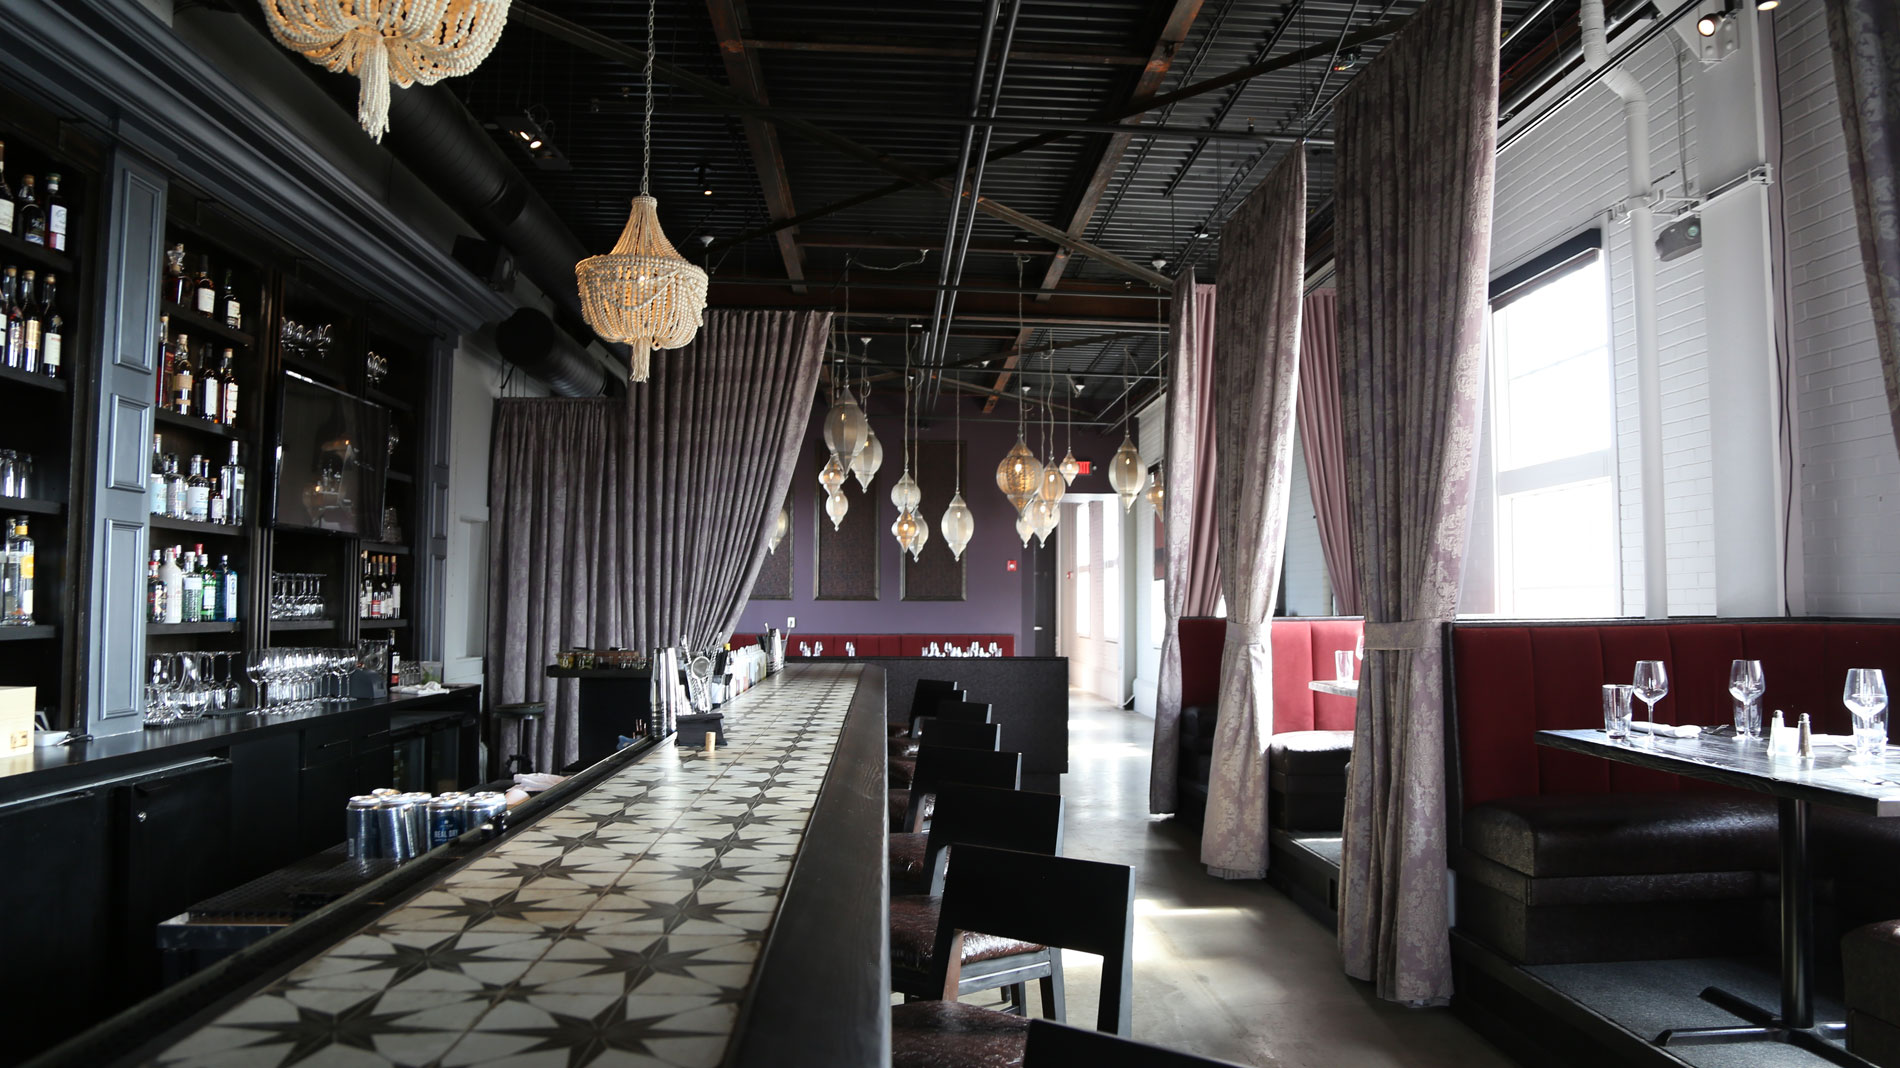 a dark empty elegant restaurant bar with drapes and lanterns